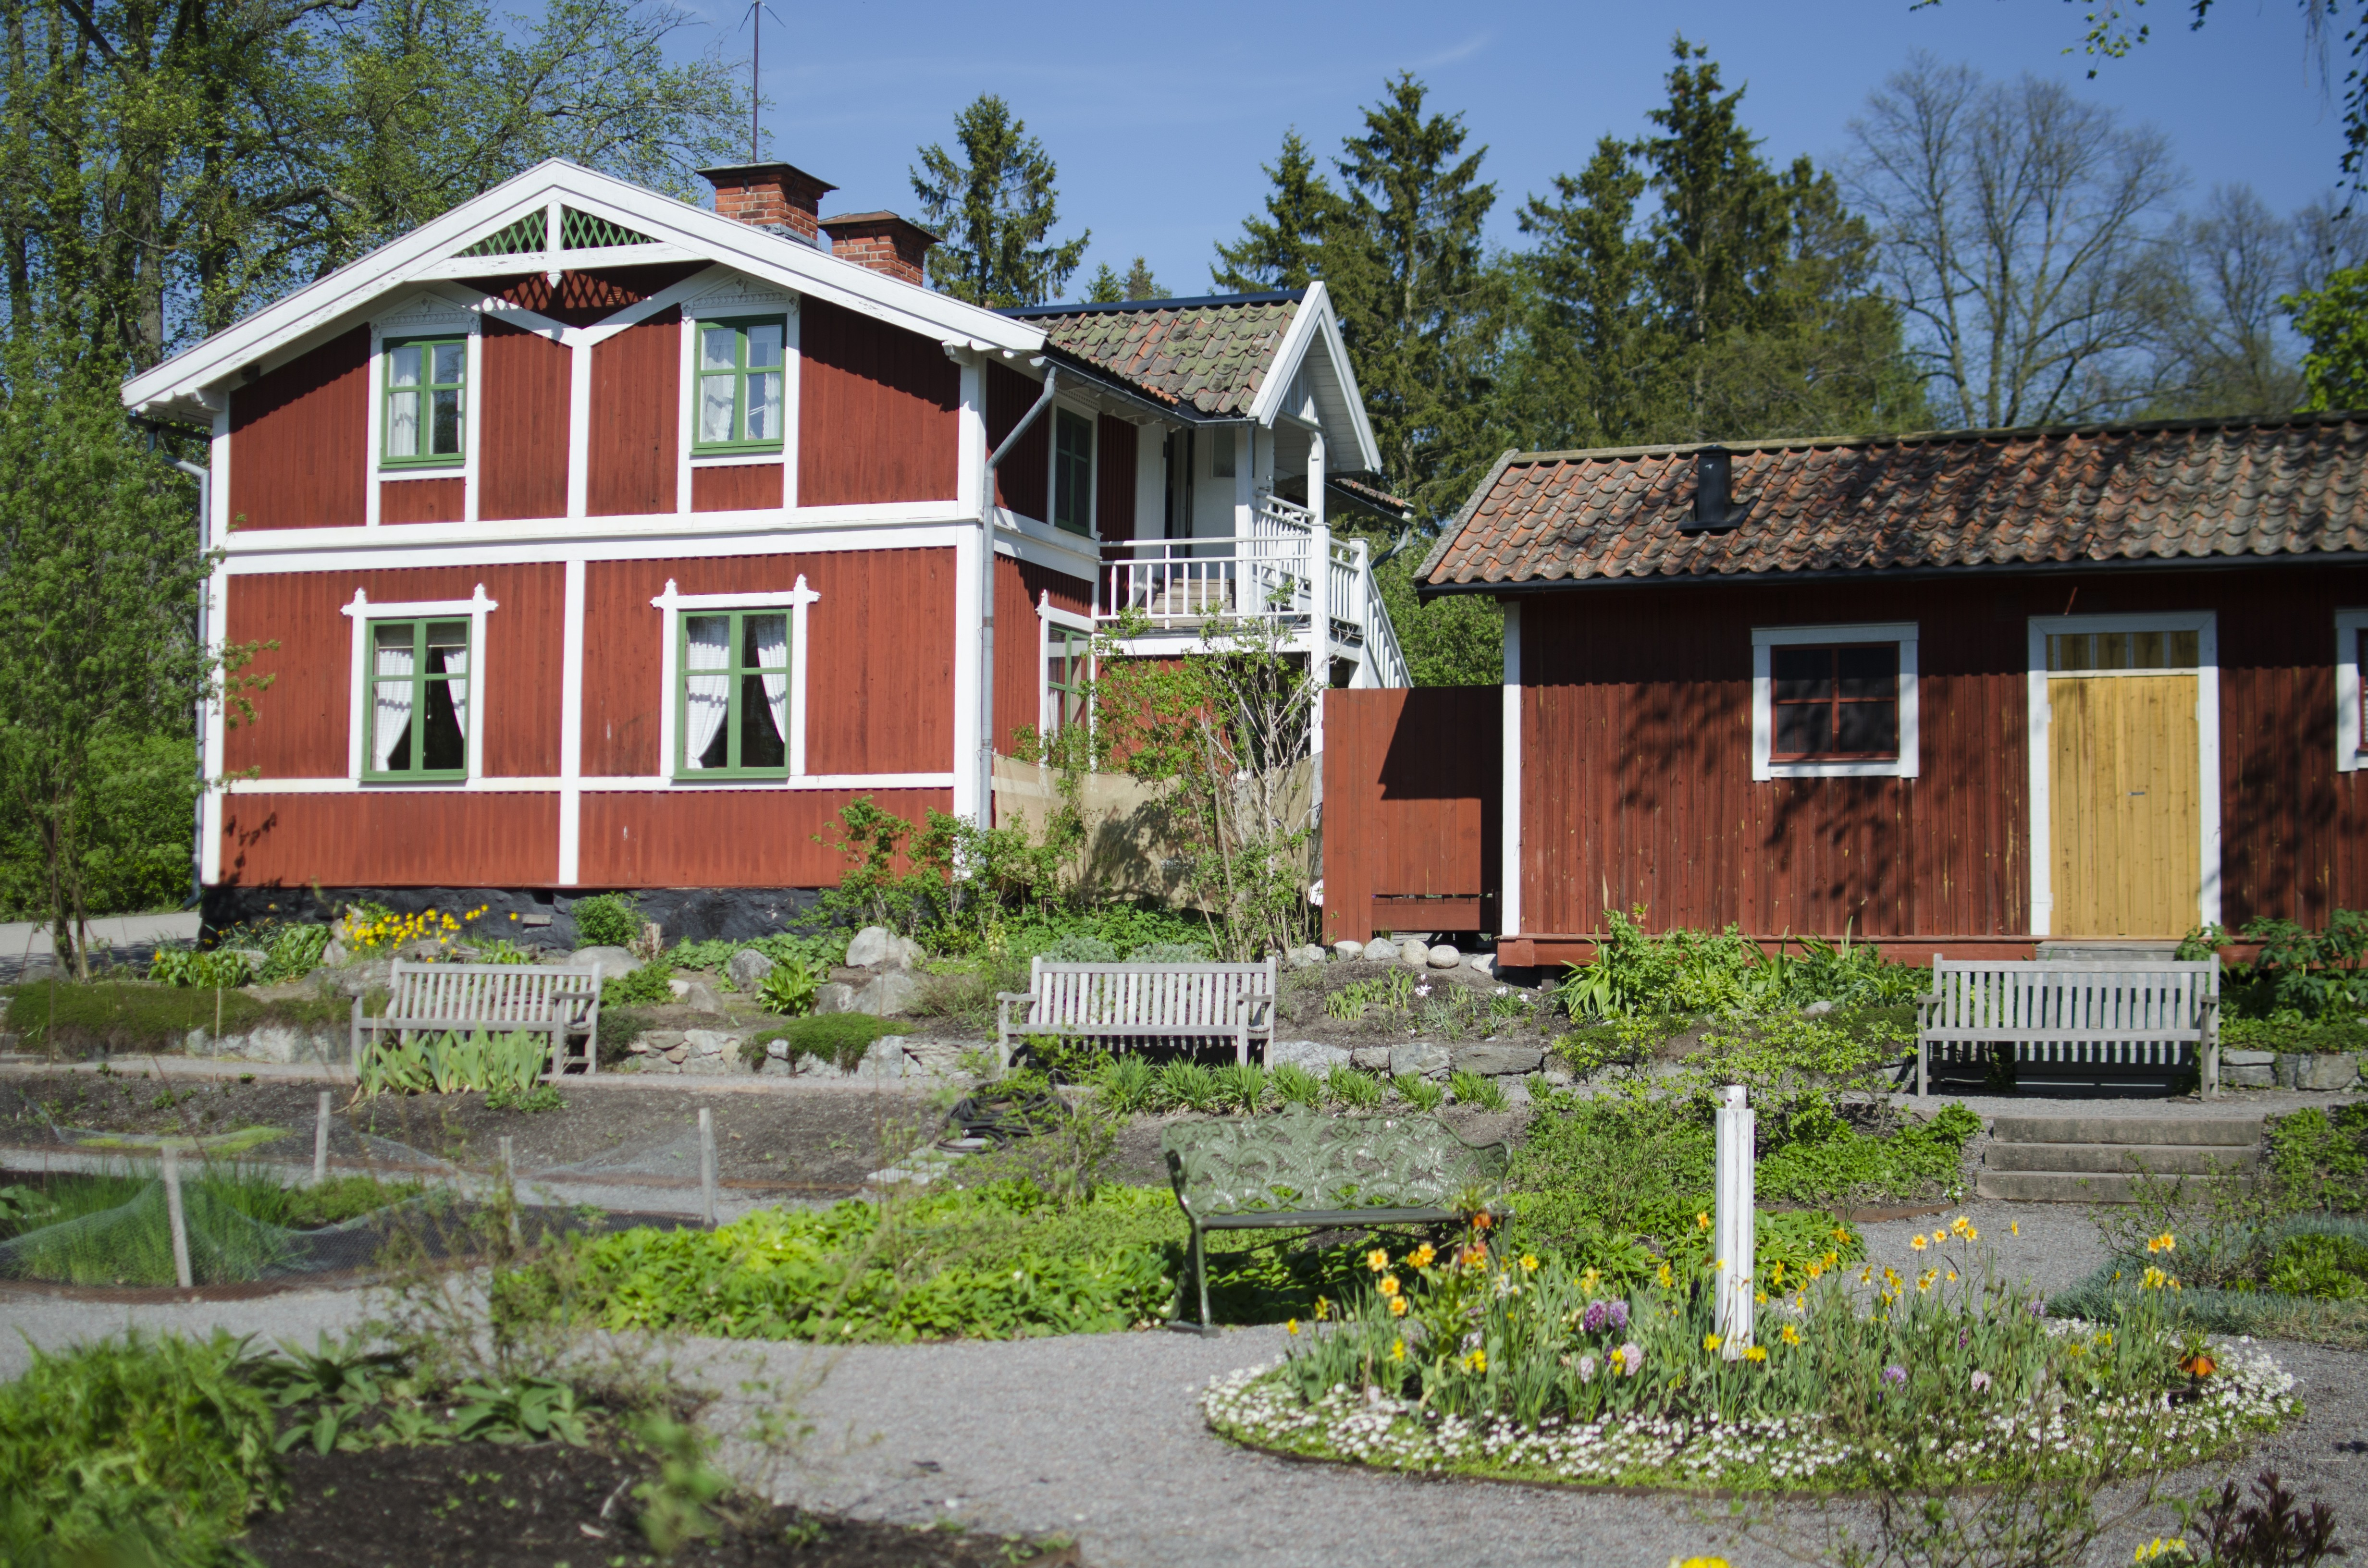 Muzeul Skansen